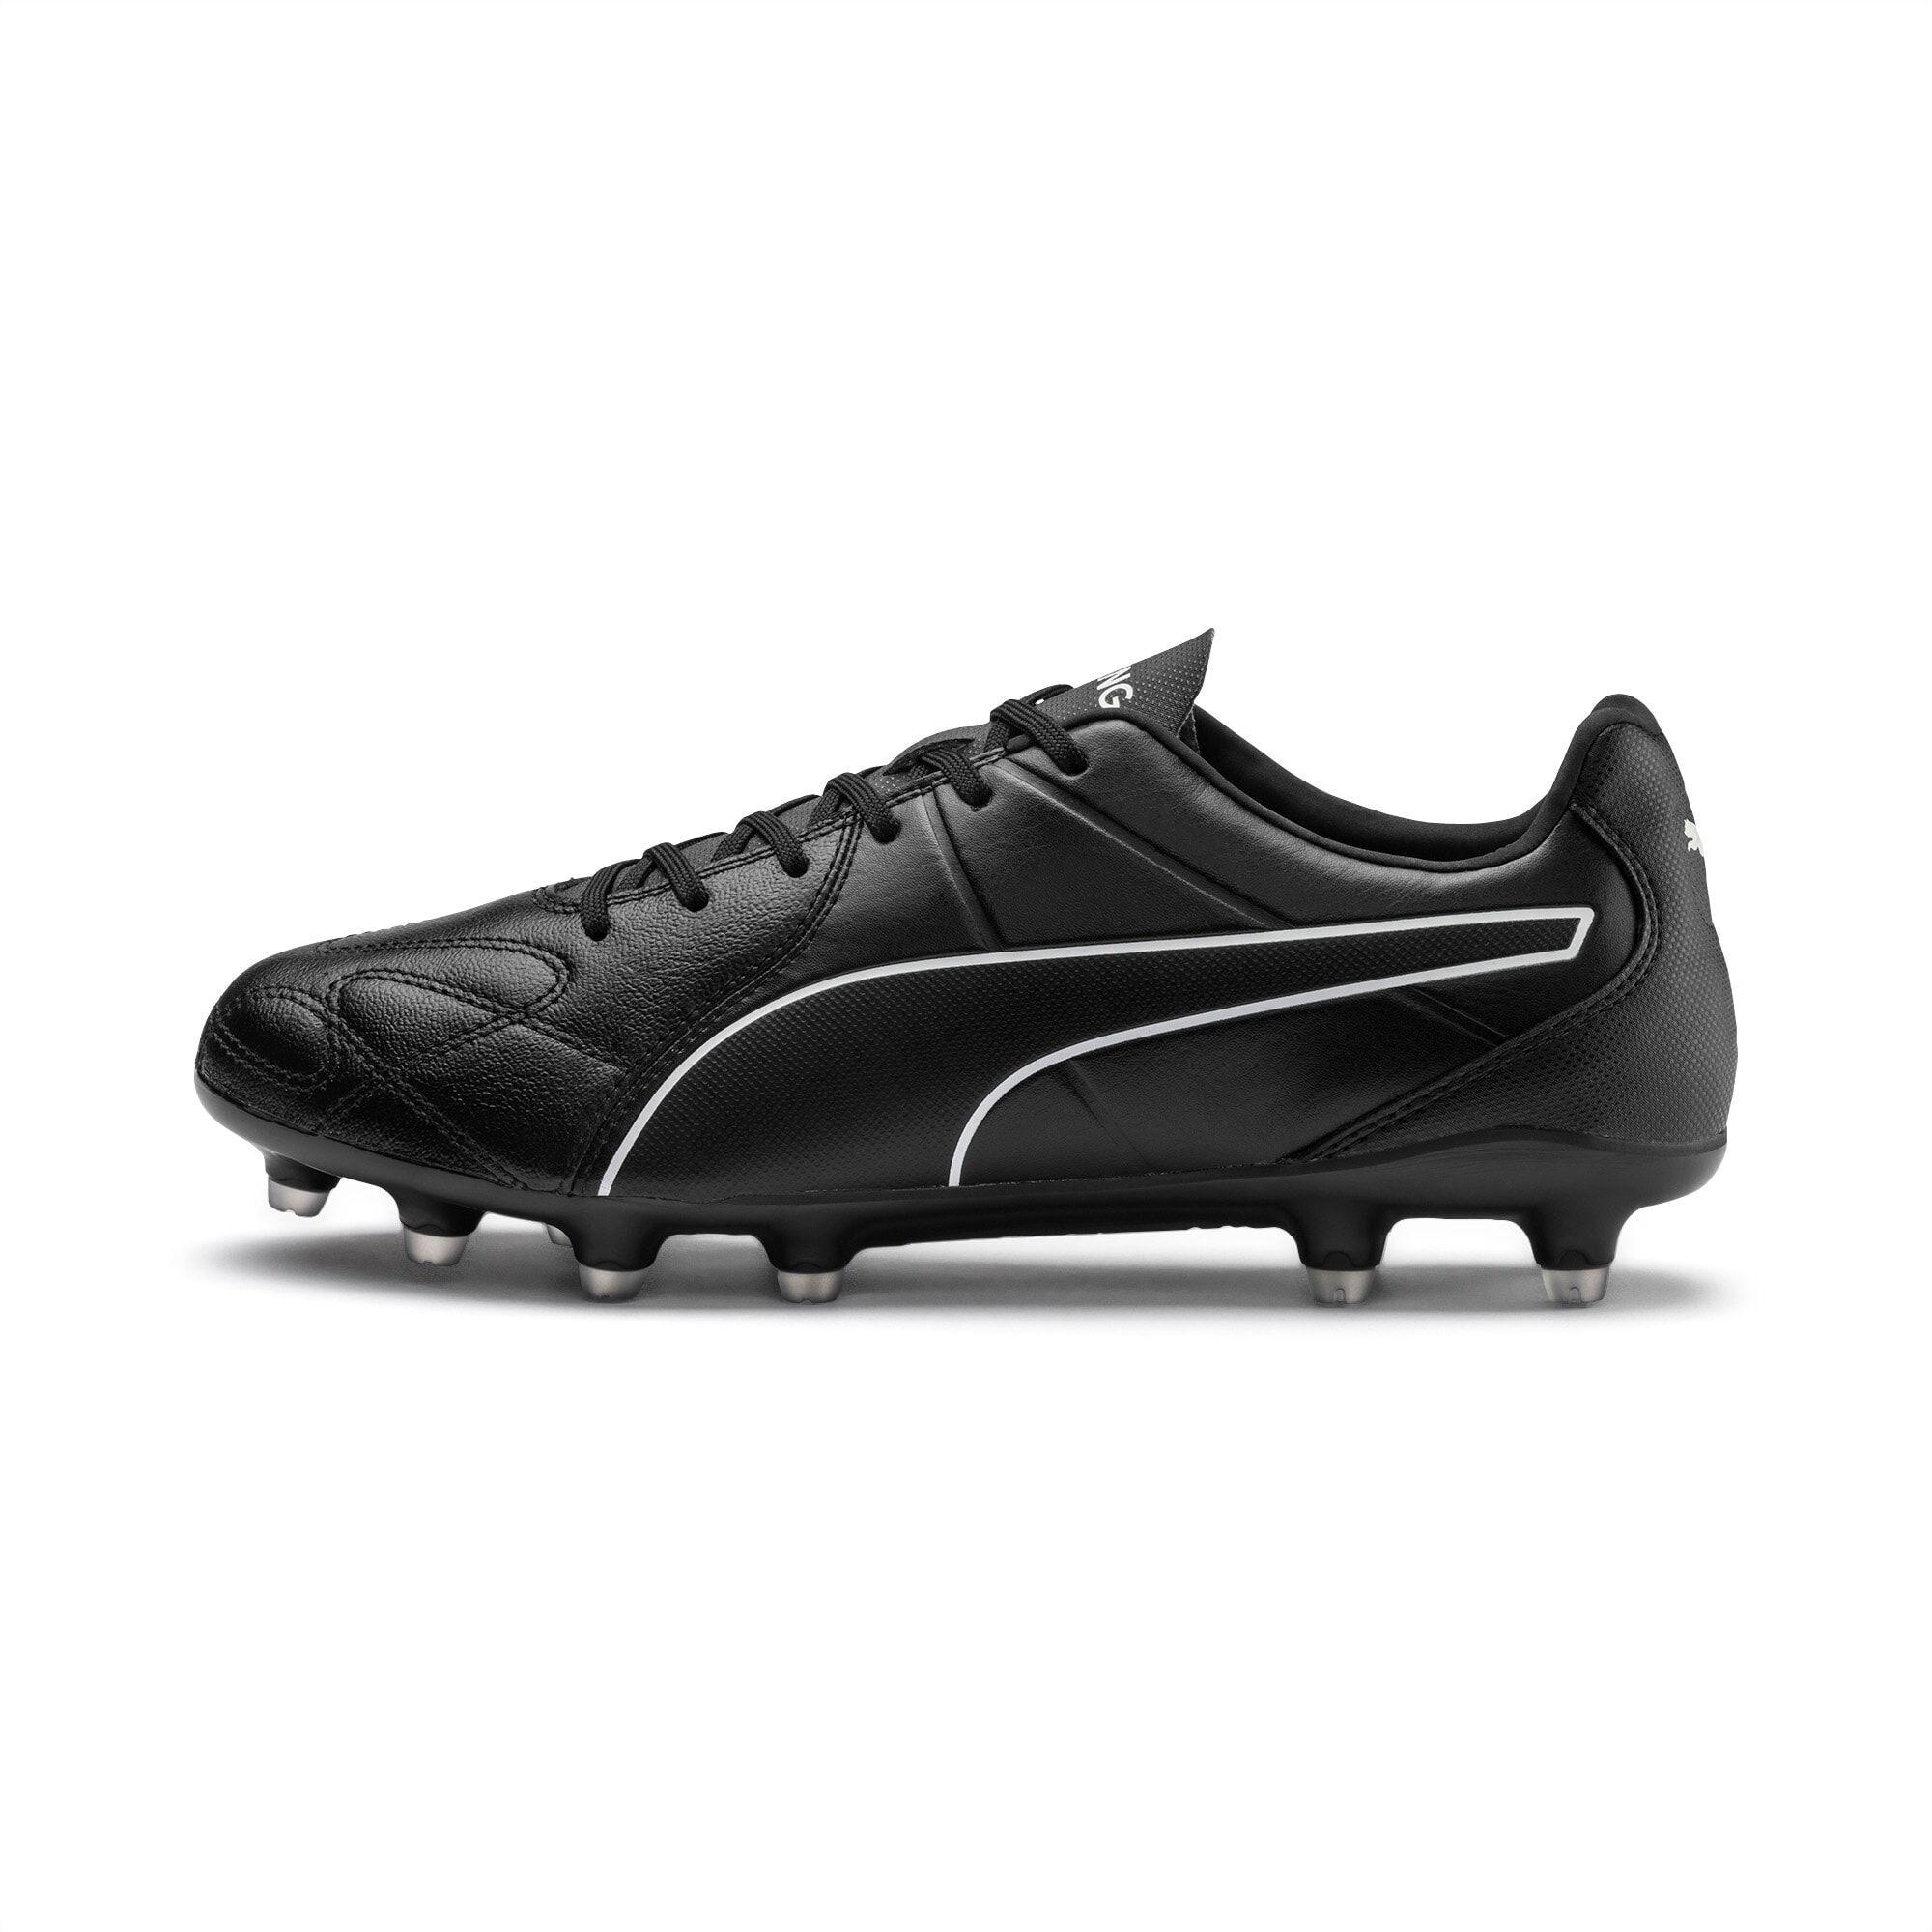 PUMA Chaussure de foot KING Hero FG, Noir/Blanc, Taille 45, Accessoires